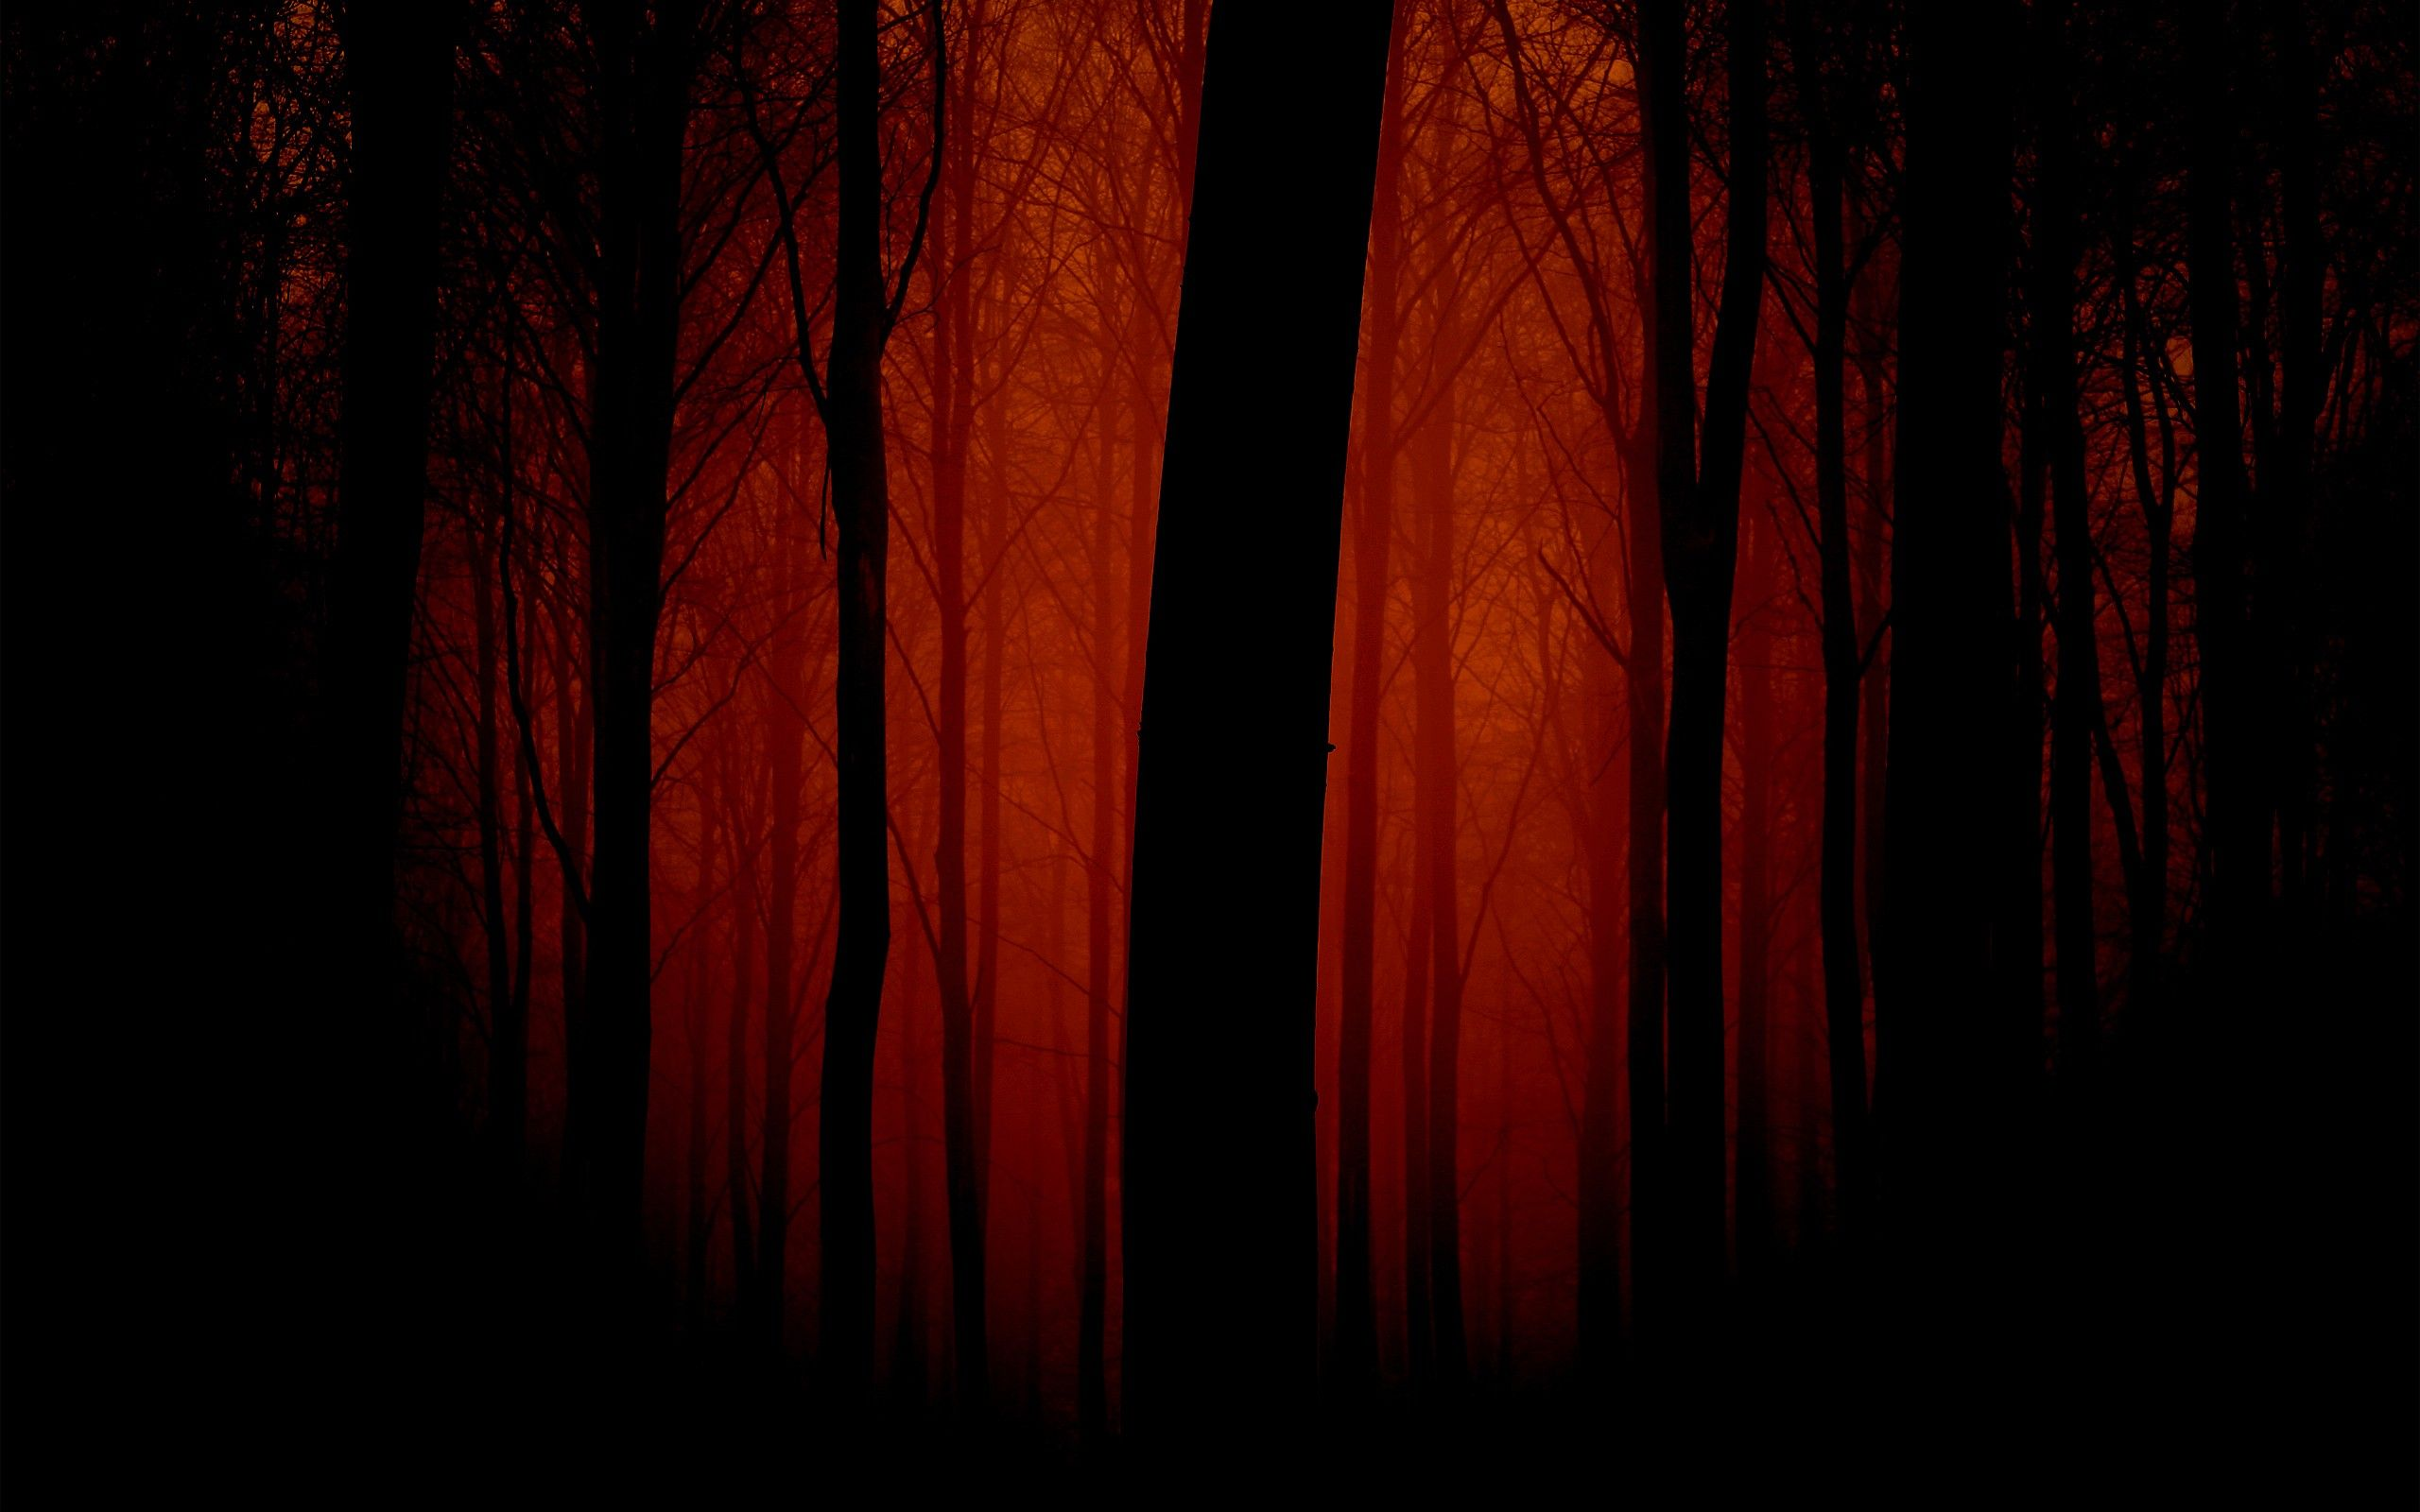 Dark Red Hd Wallpapers 2 Dark Red Hd Wallpapers